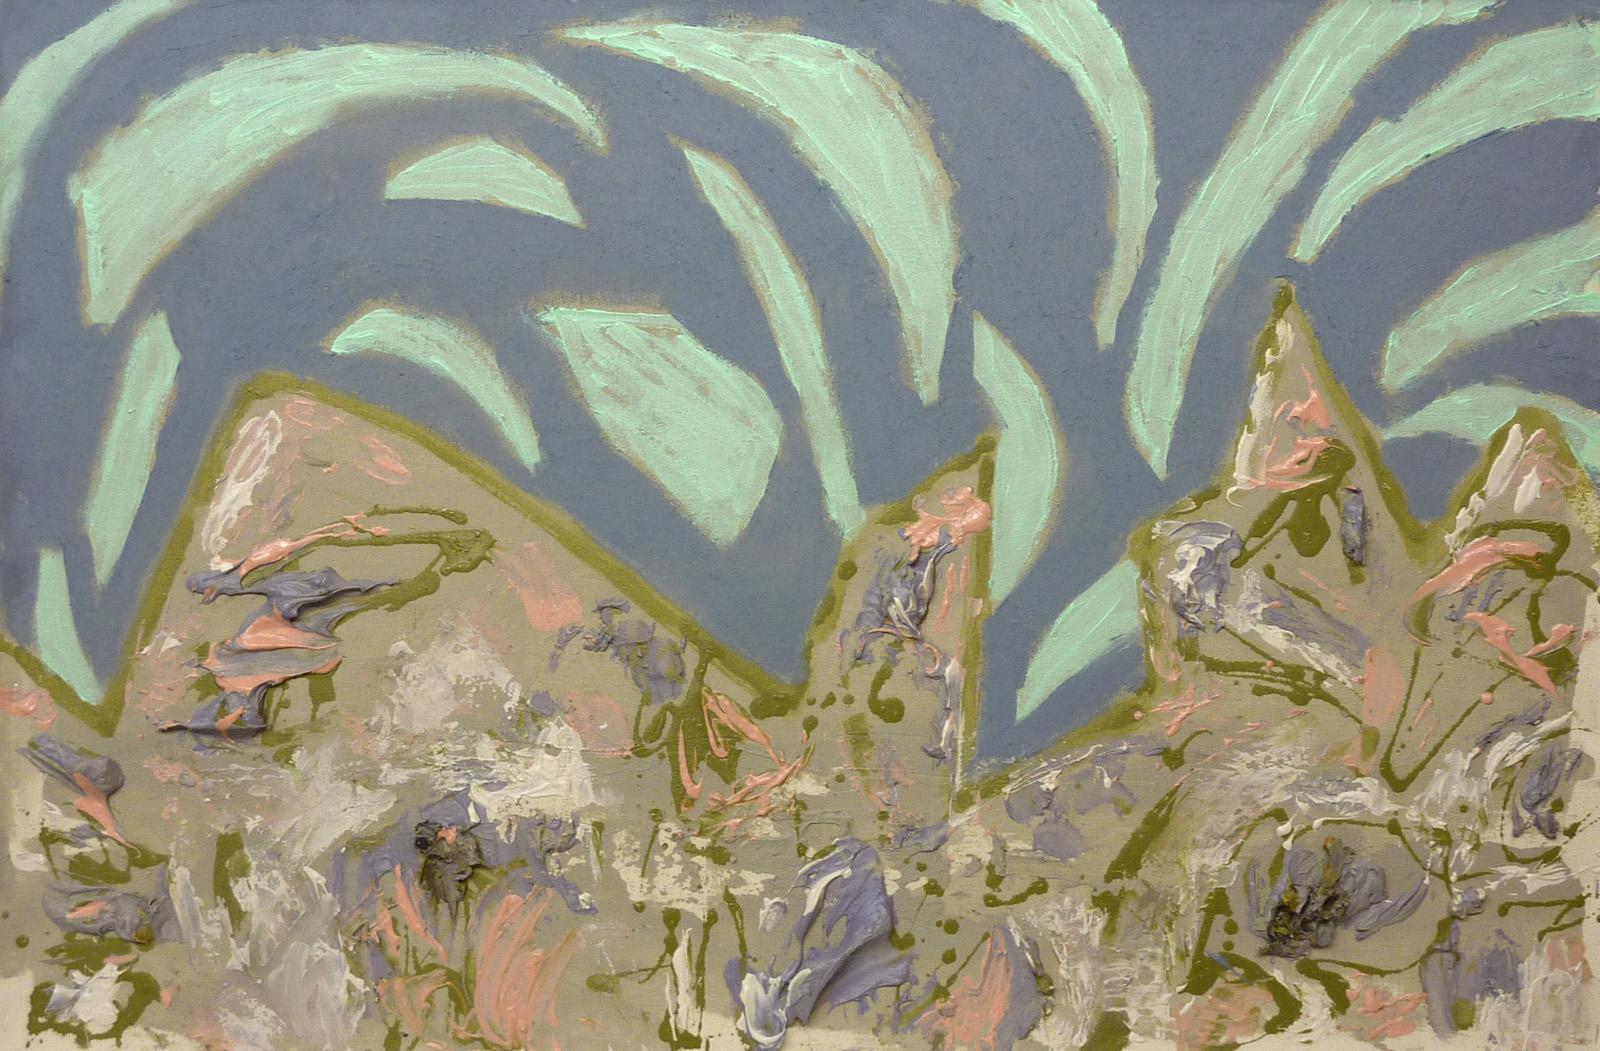 "Scott BennettSpring Dance (2015) acrylic on canvas 23.5"" x 35{quote}"